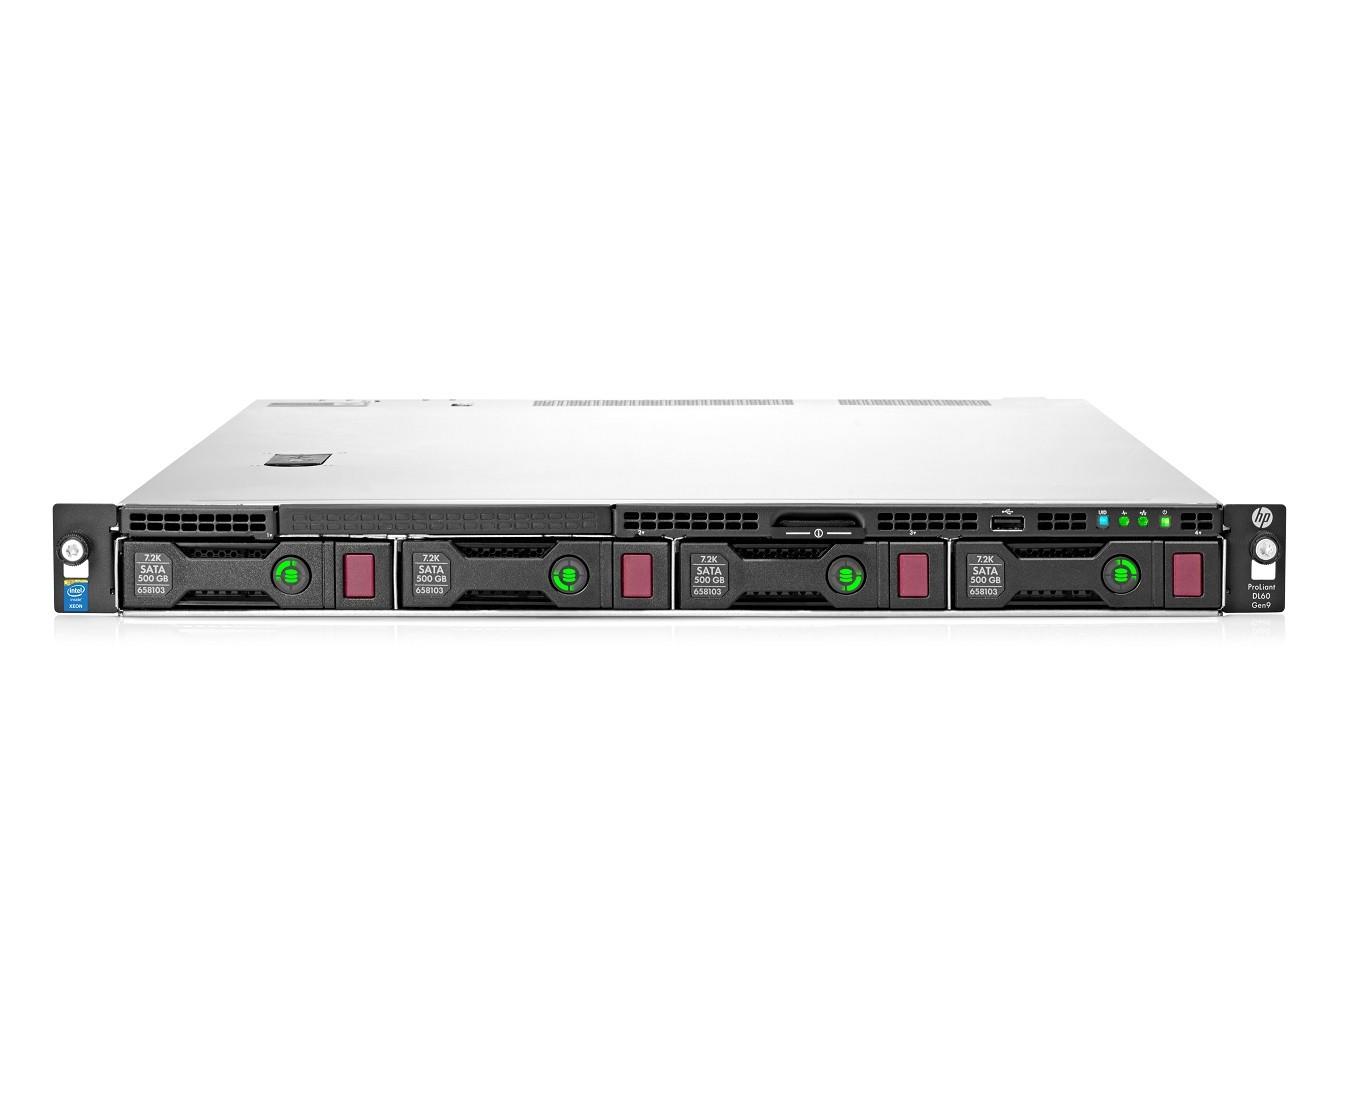 DL60 Gen9 E5-2620v4 2.1GHz 1P 8C 16GB, 4LFF, SR B140i SATA, non-HDD, 550W (777403-B21)